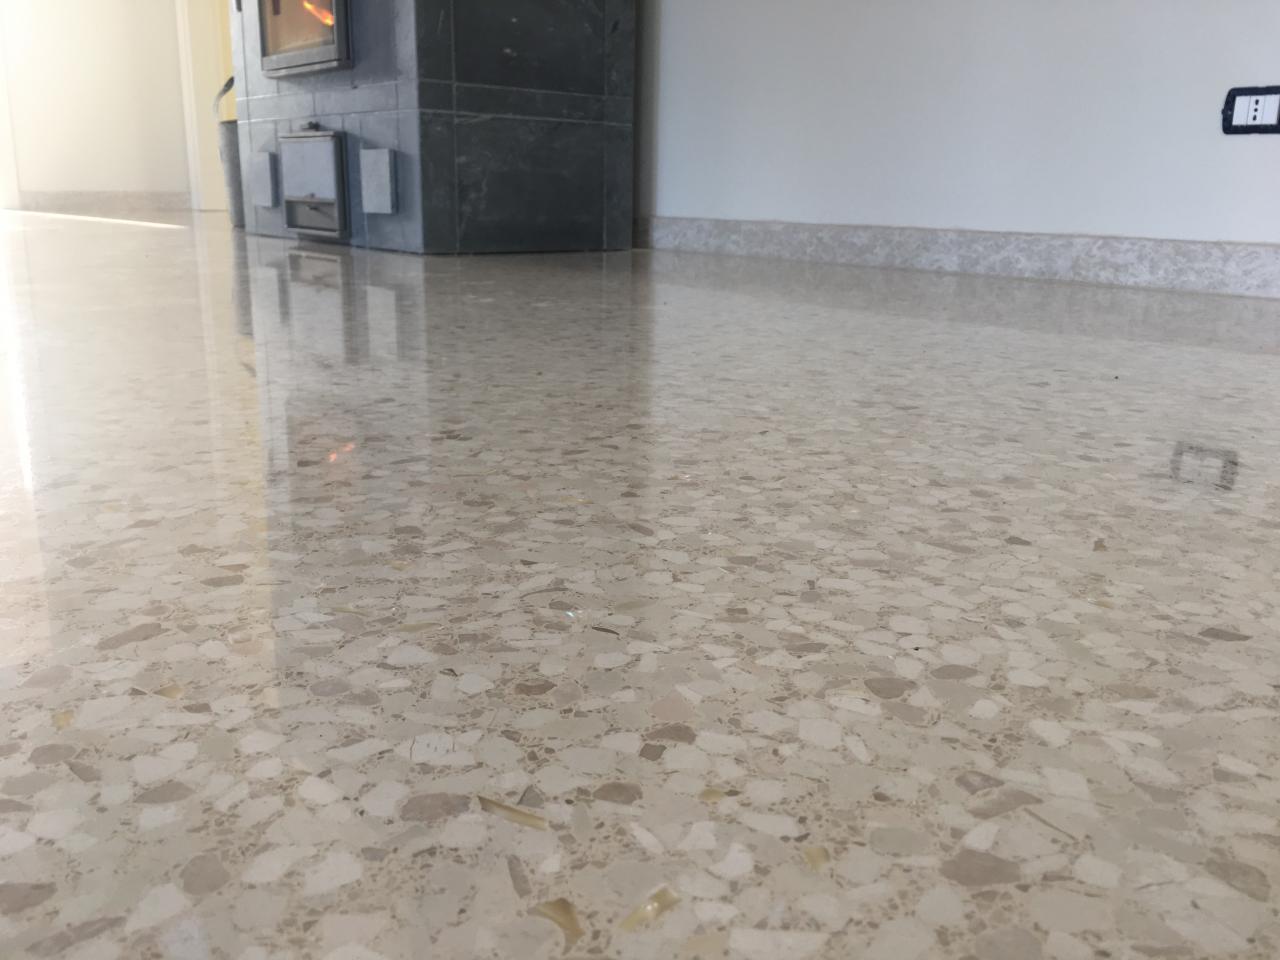 Pavimento veneziana a vicenza e verona fratelli pellizzari for Veneziana pavimento